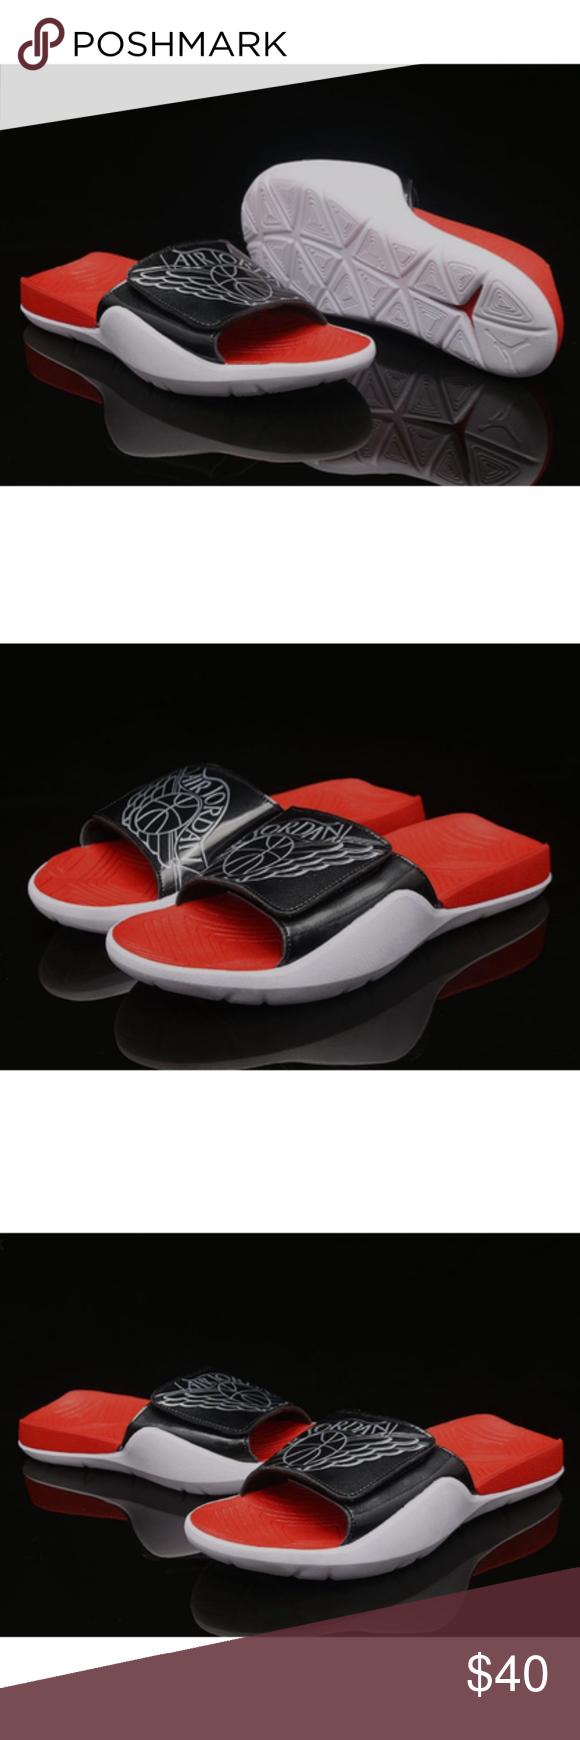 45642e57abe4 Nike JORDAN HYDRO 7 Men s Sandals Slides The Jordan Hydro 7 Men s Slide  provides a cushioned